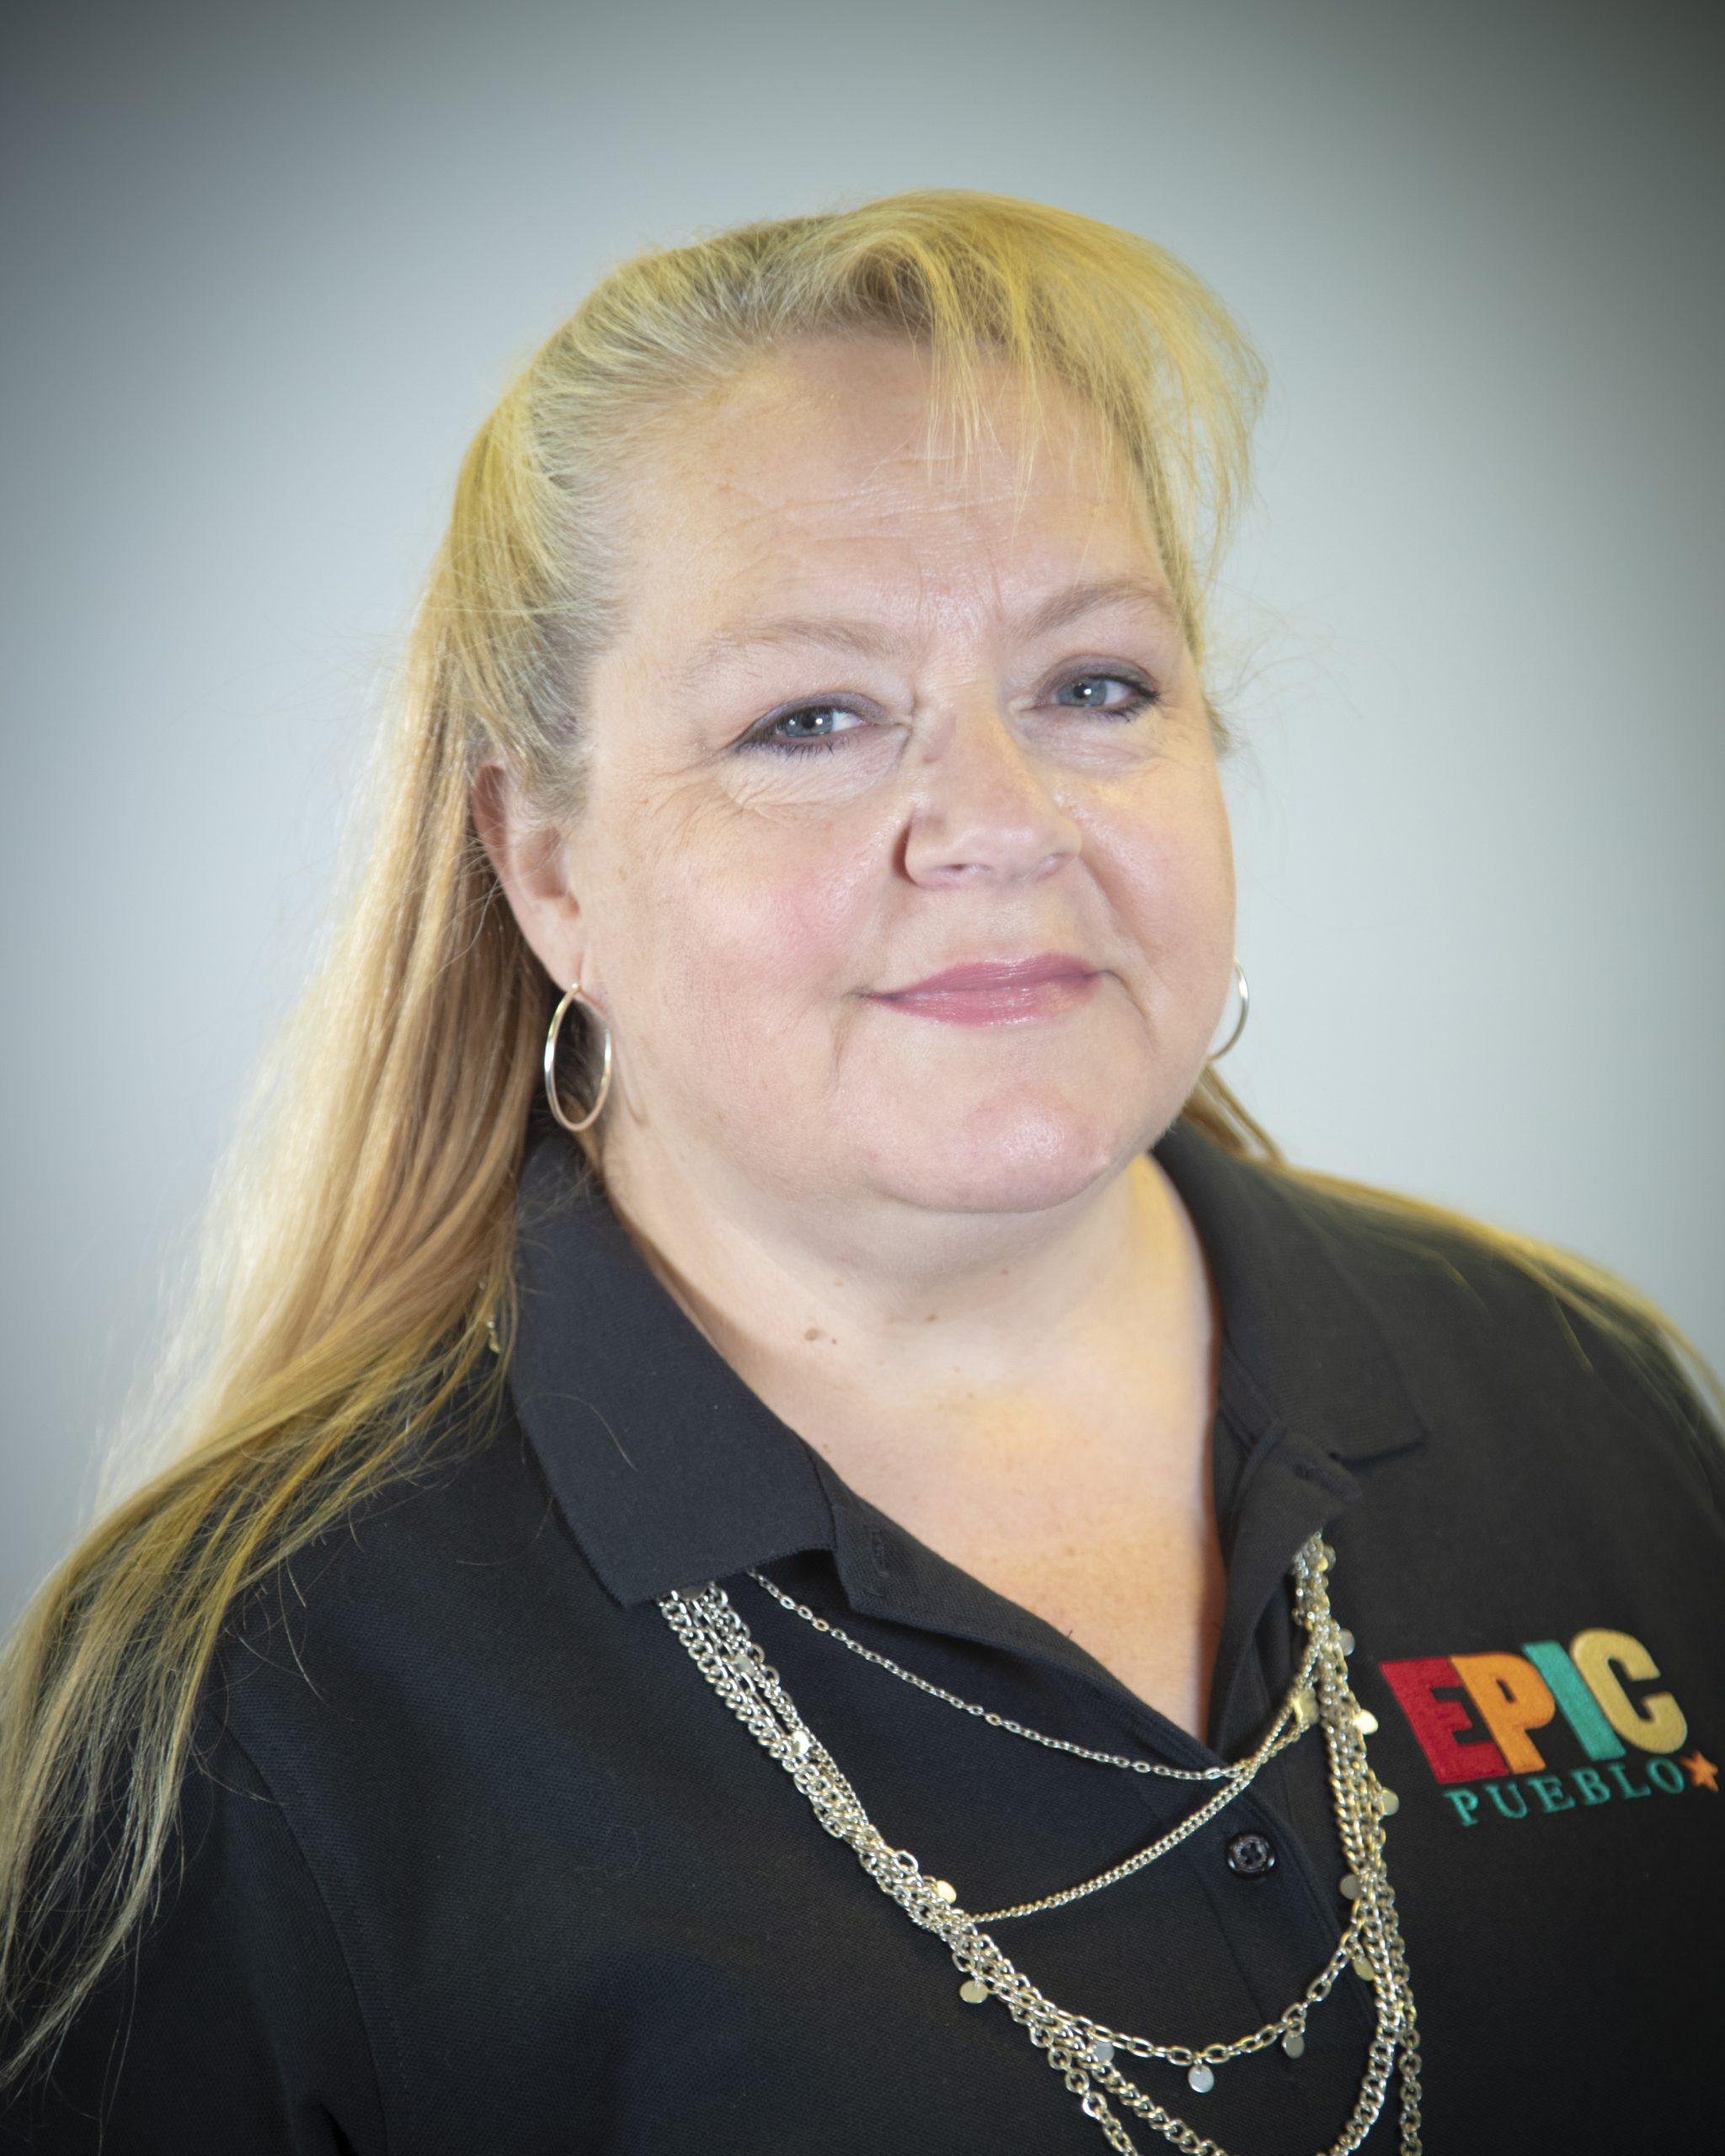 EPIC Pueblo Angela Shehorn